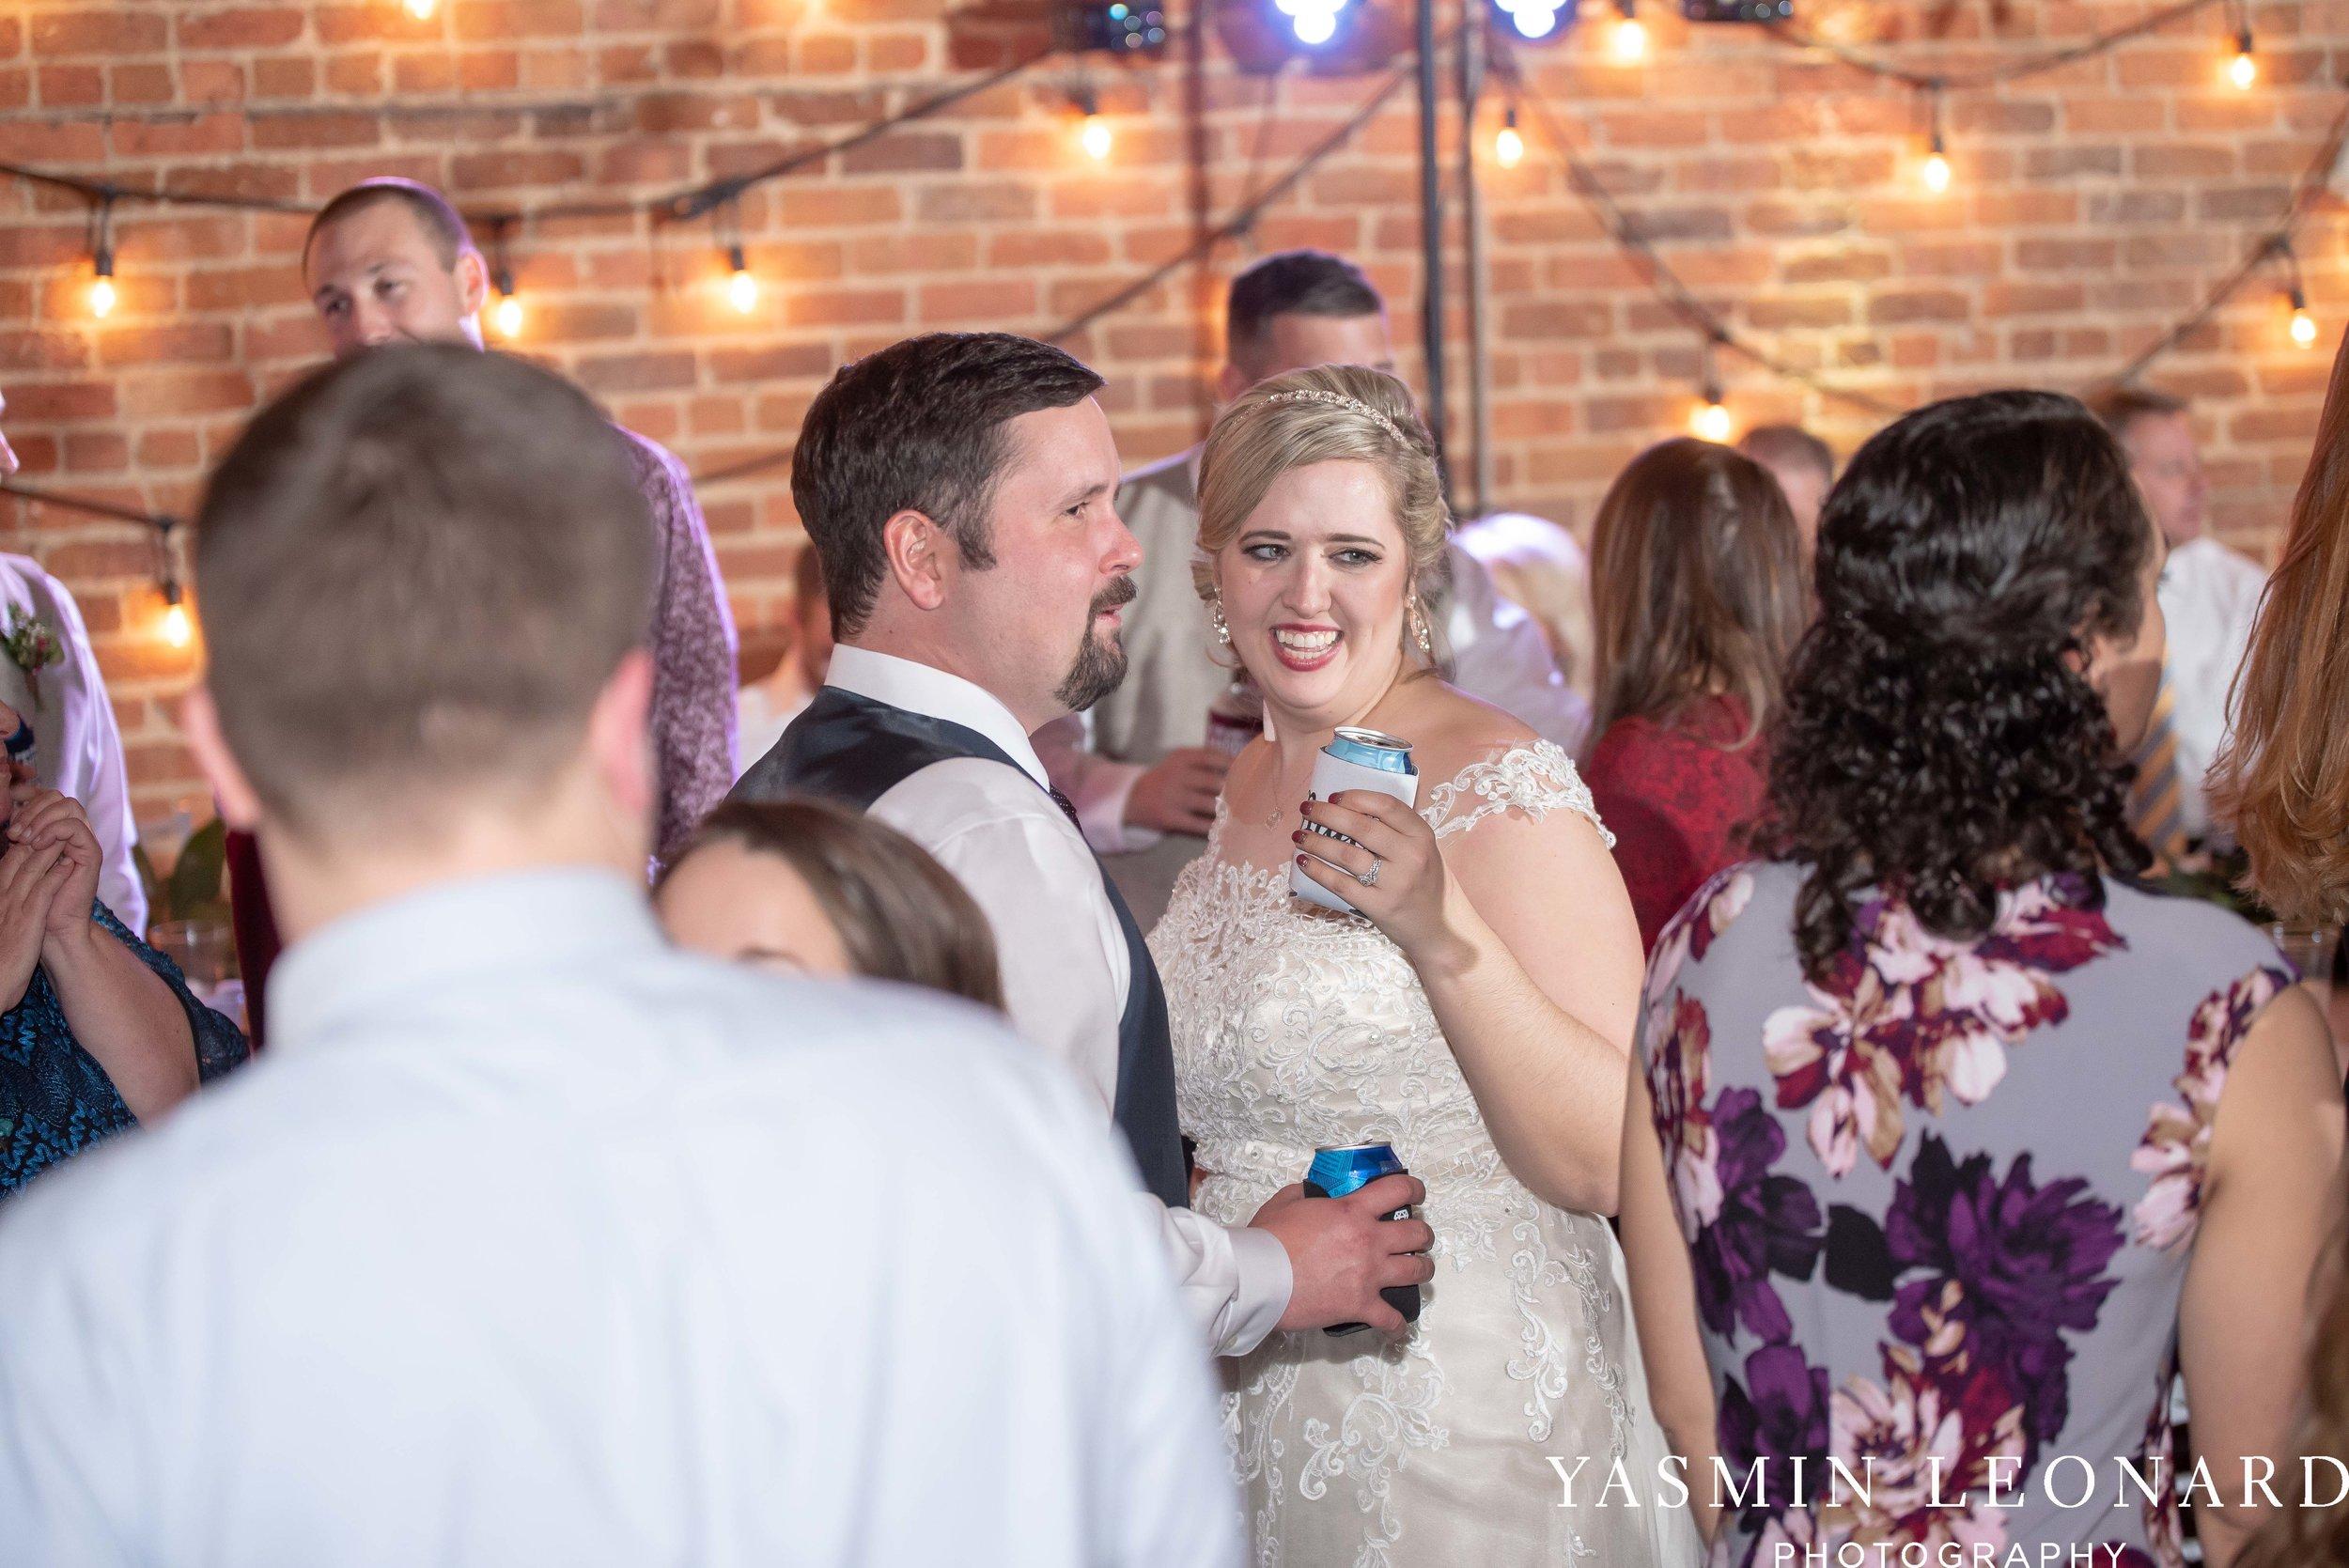 Rebekah and Matt - 105 Worth Event Centre - Yasmin Leonard Photography - Asheboro Wedding - NC Wedding - High Point Weddings - Triad Weddings - Winter Wedding-61.jpg